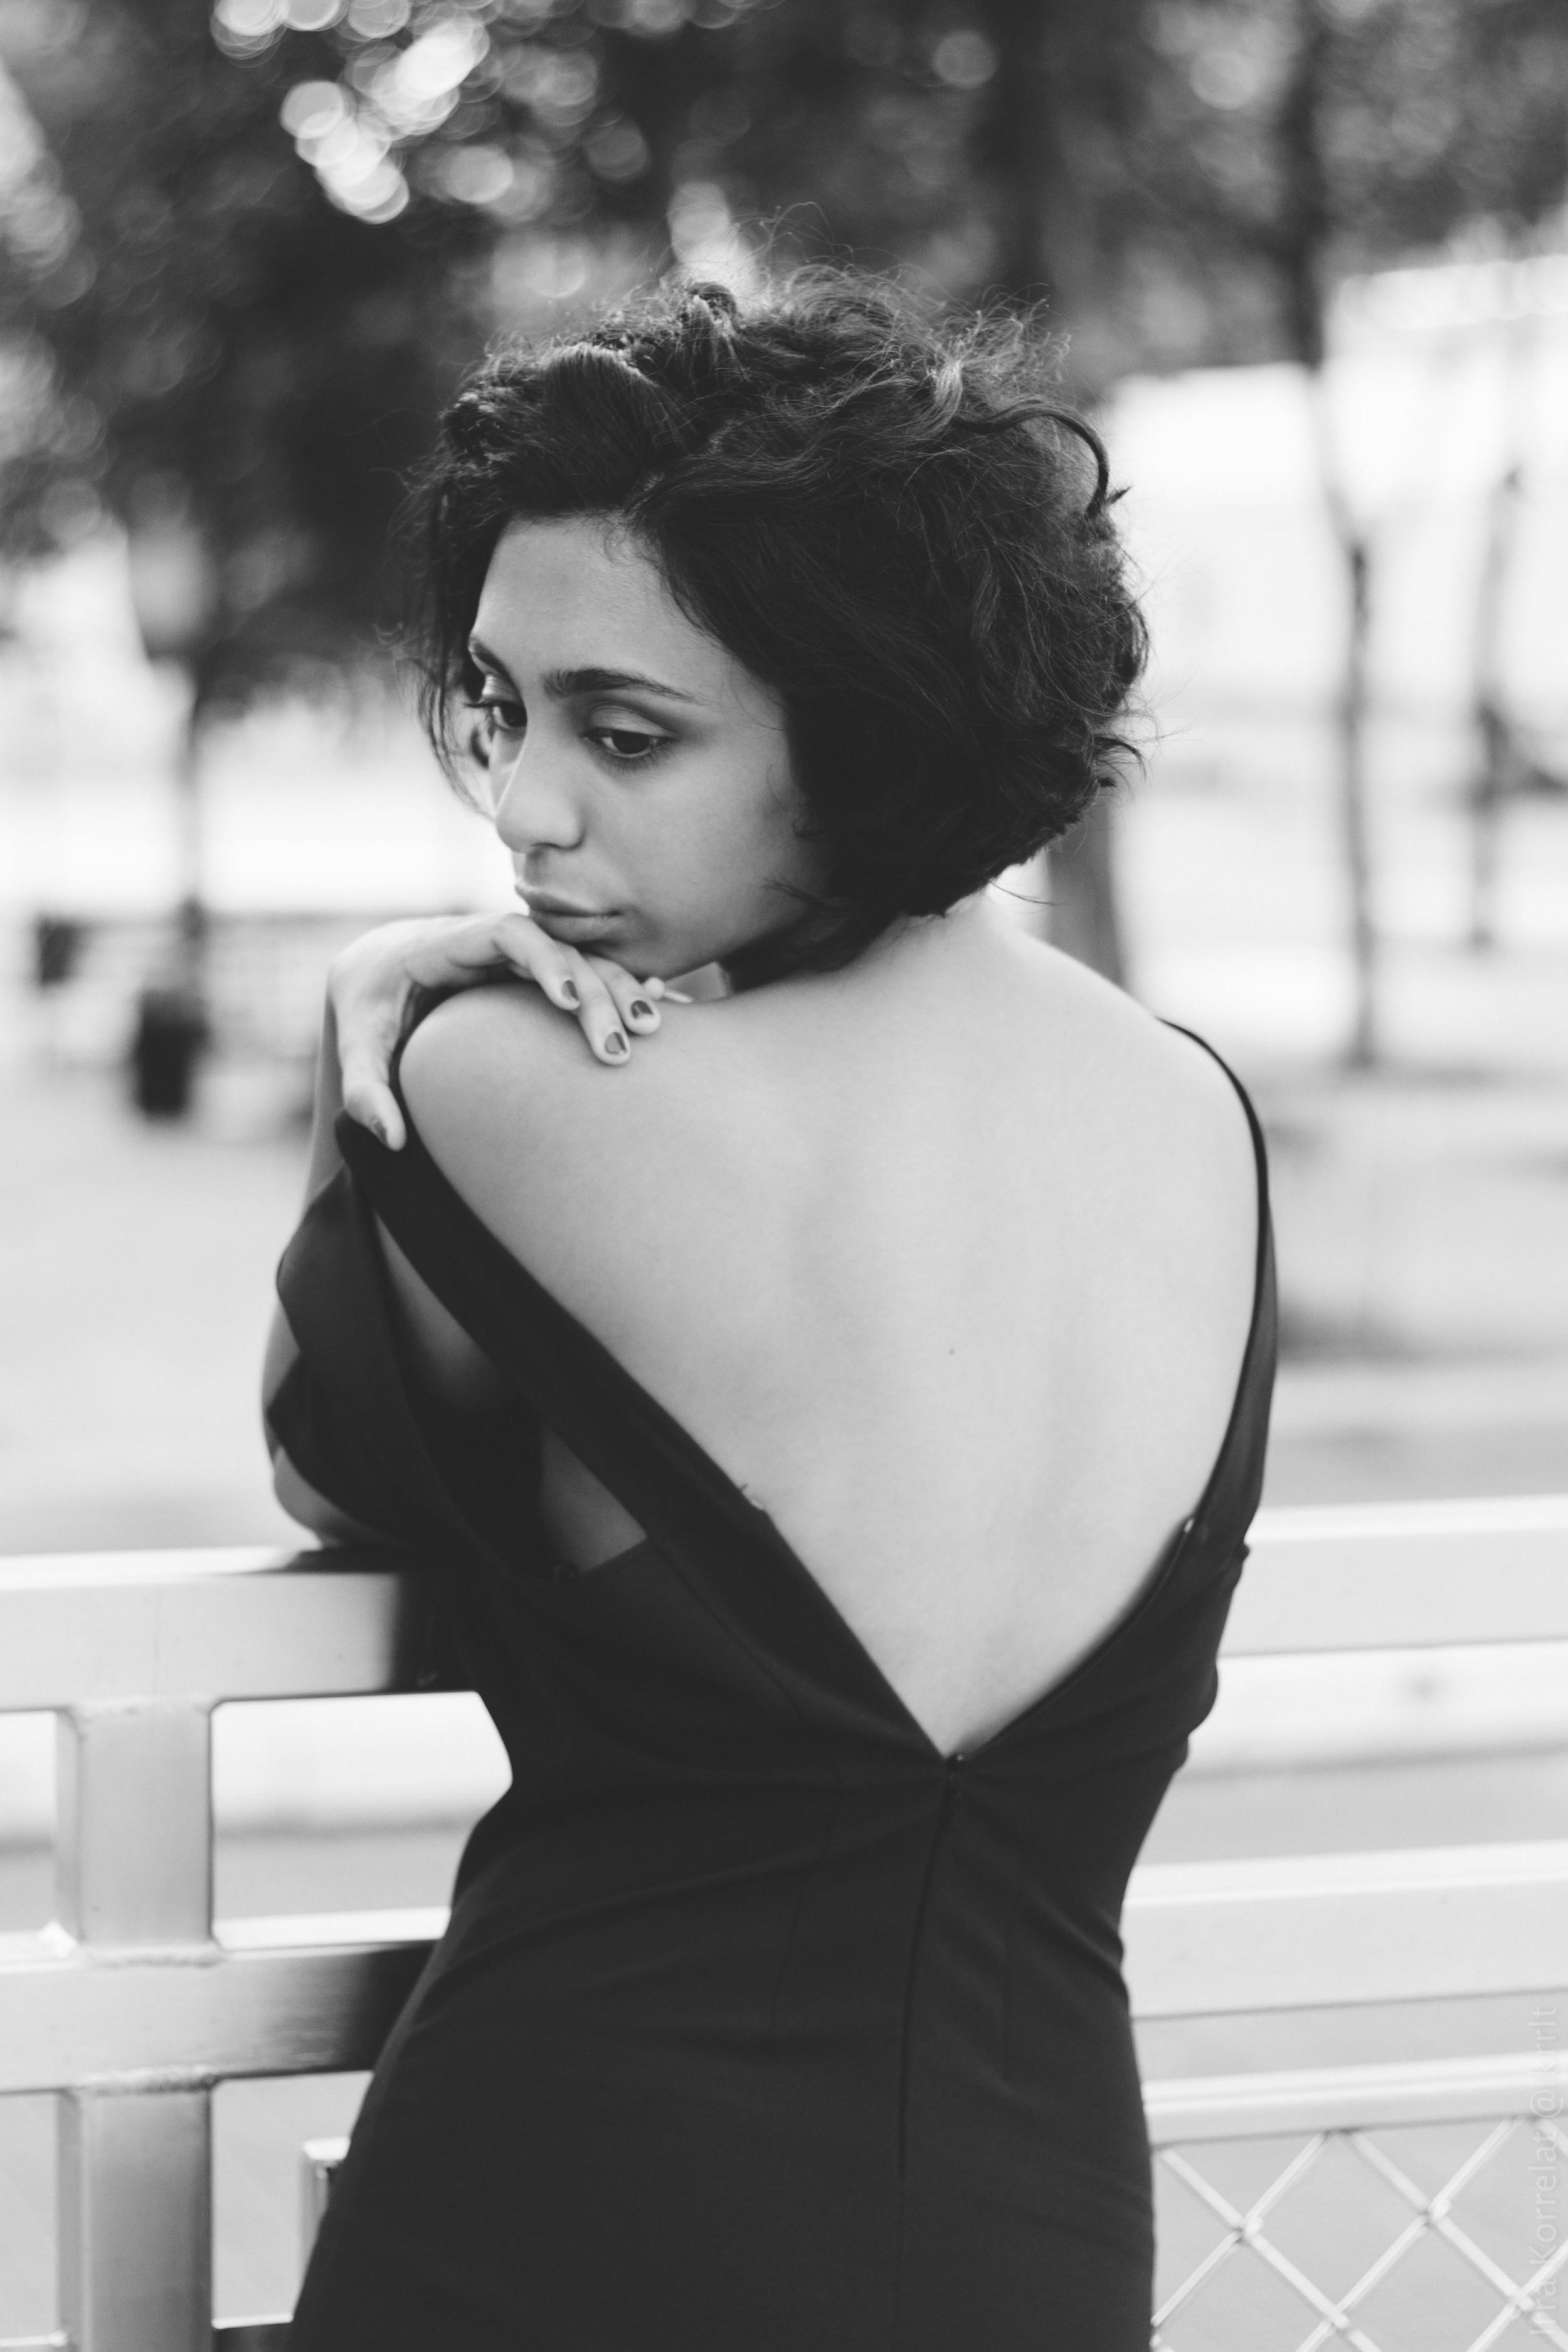 Muriha Qidwai Lincoln center portrait black white irra korrelat-2.jpg